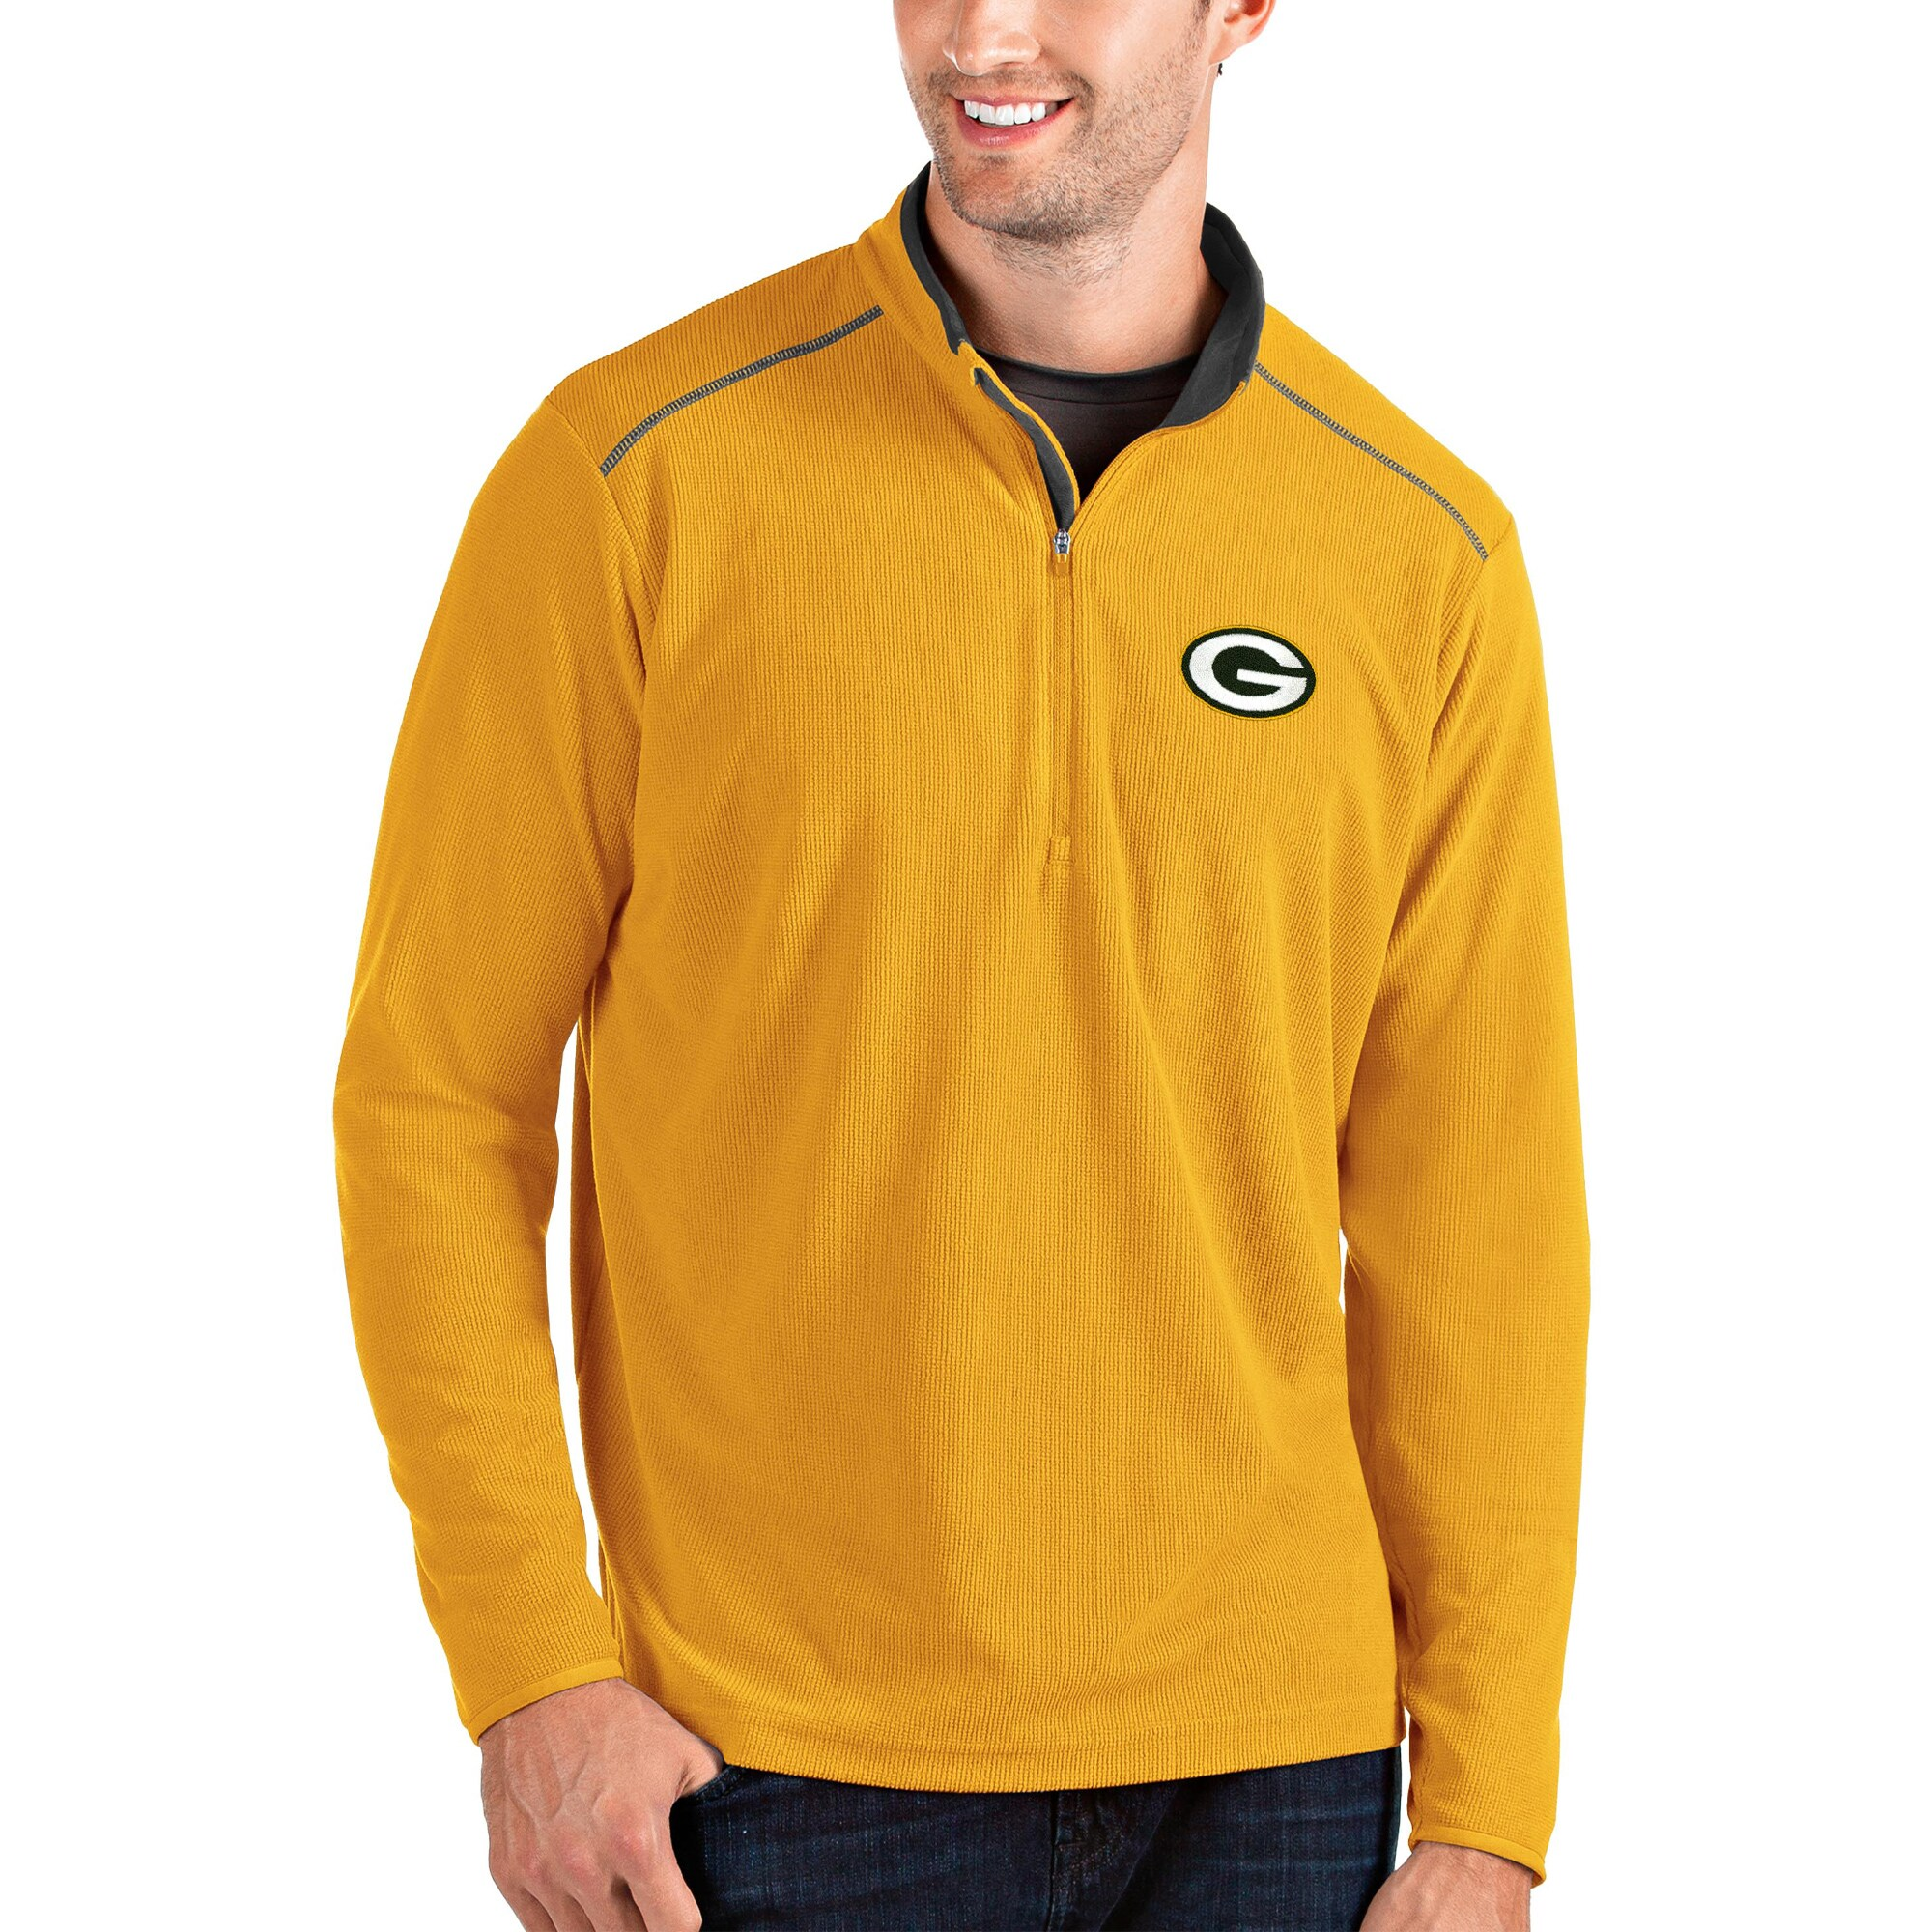 Green Bay Packers Antigua Glacier Quarter-Zip Pullover Jacket - Gold/Gray